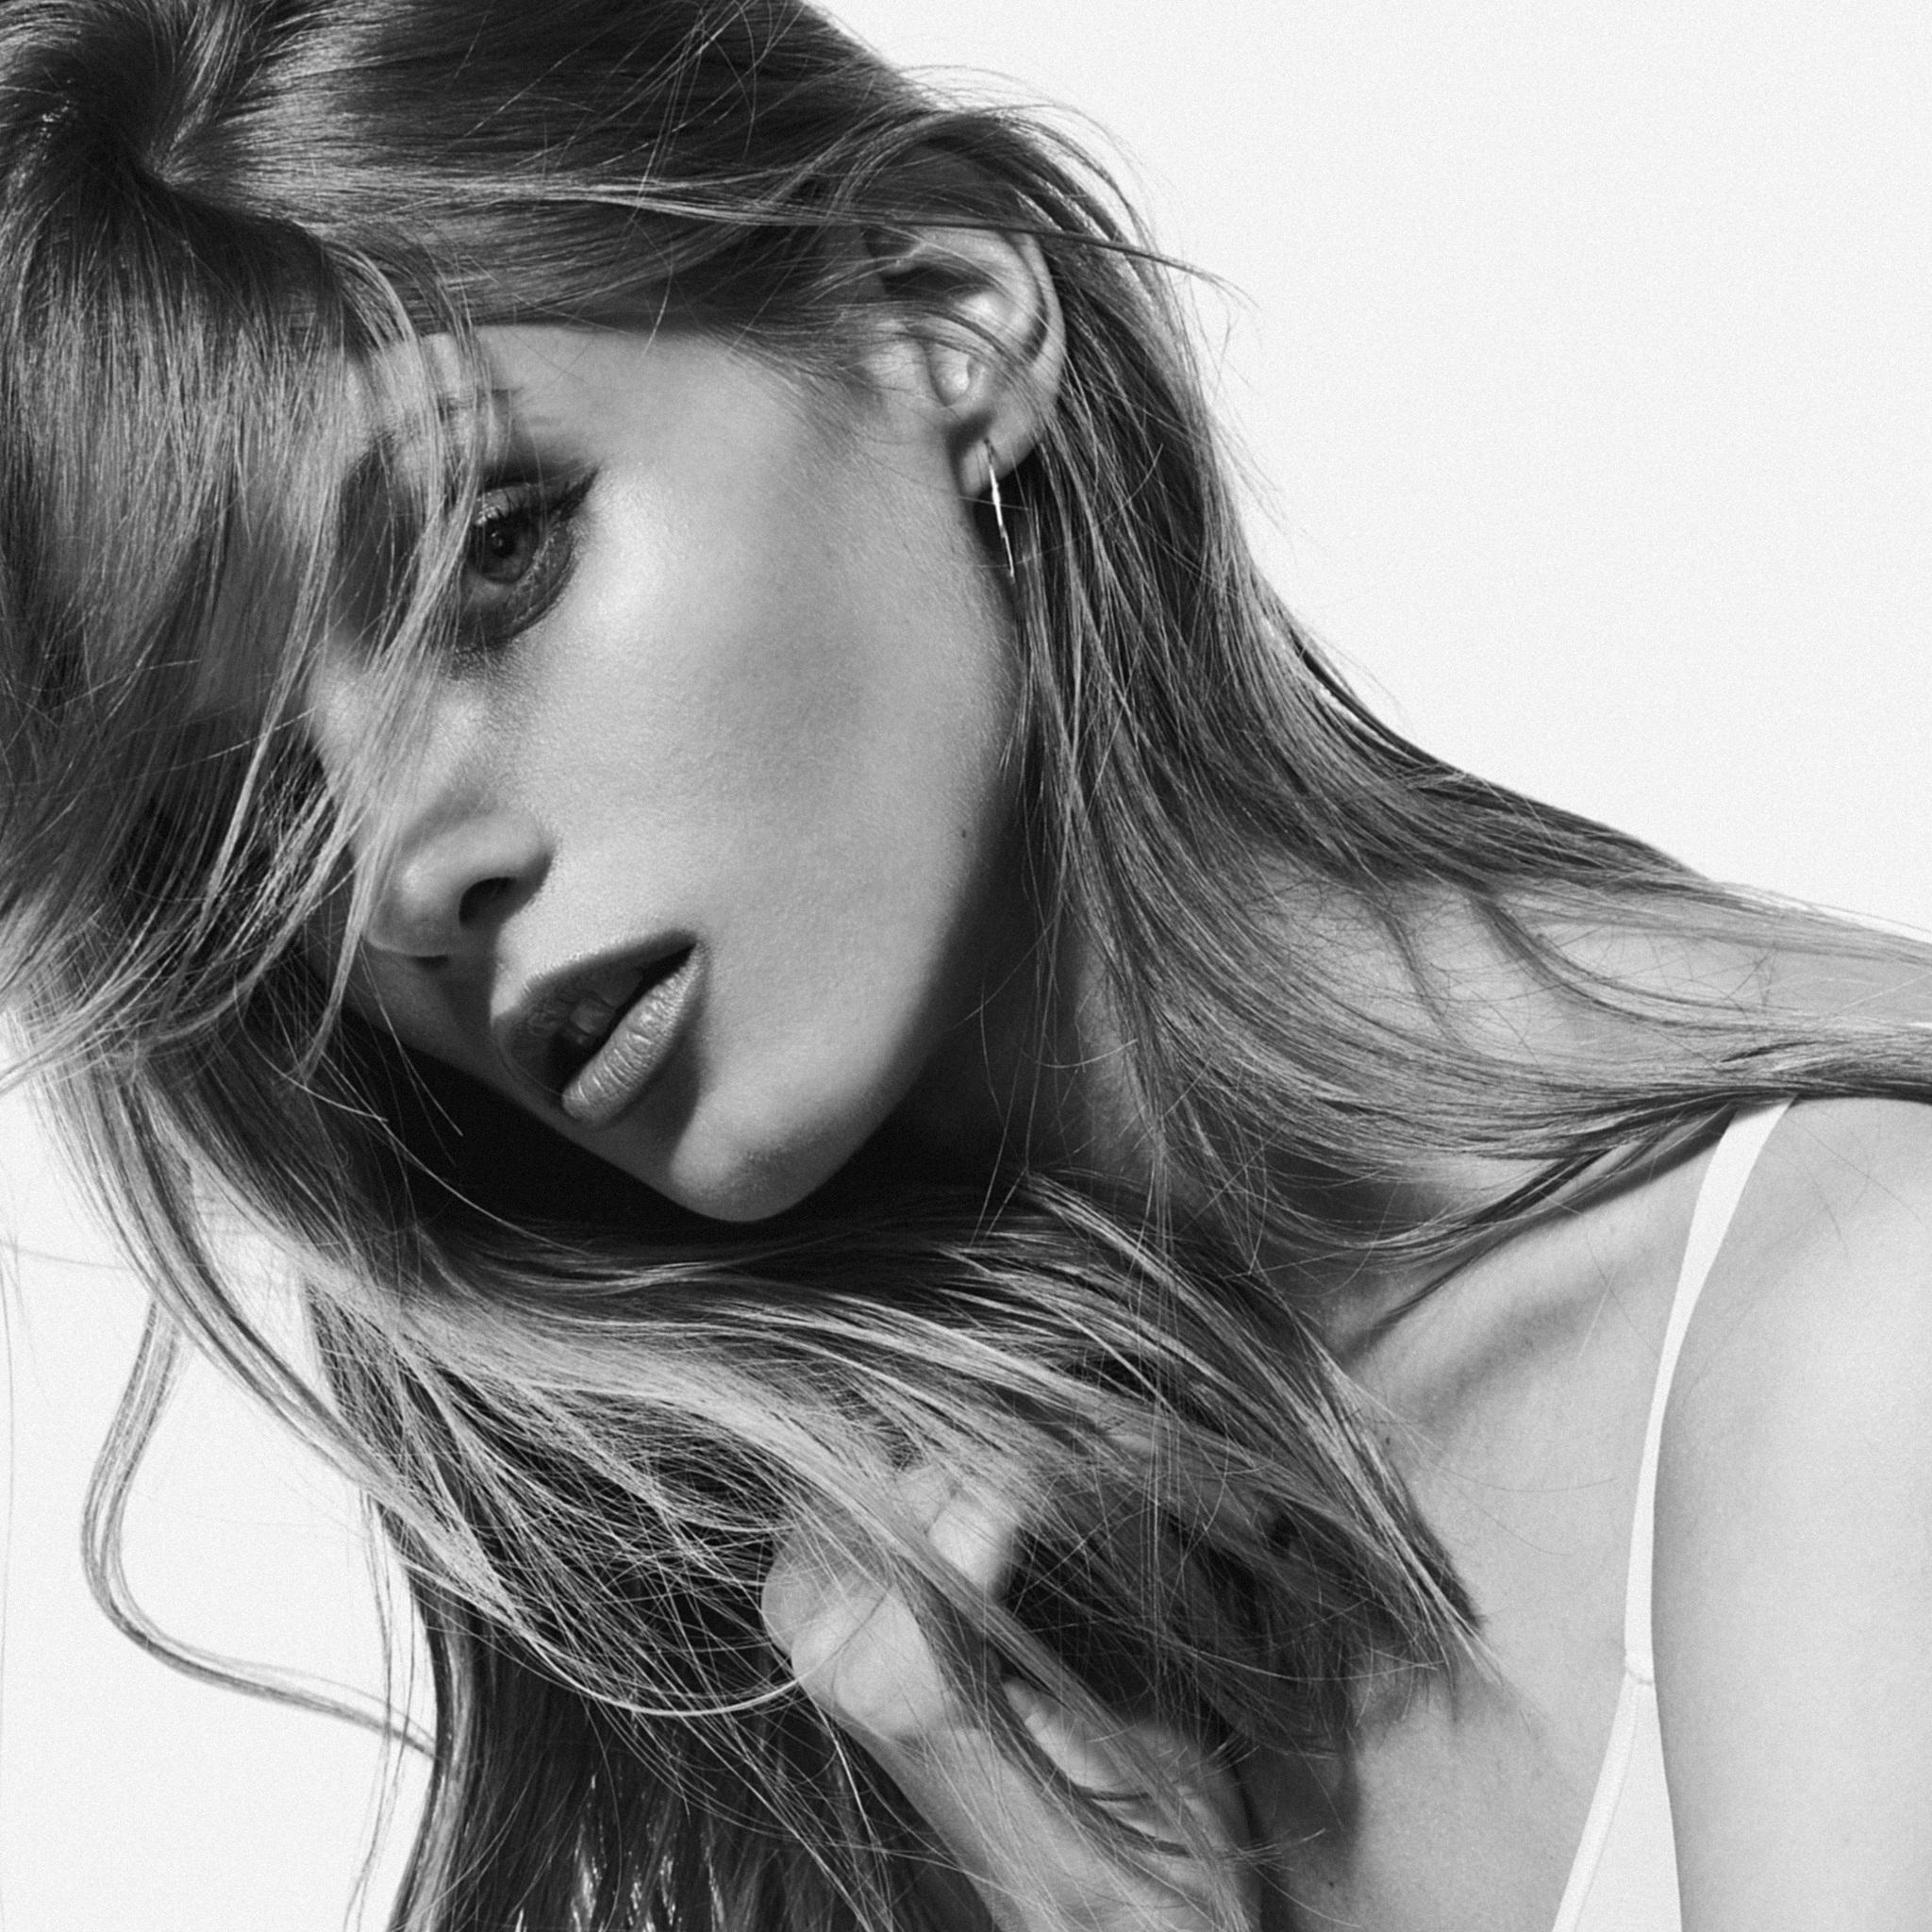 Paparazzi Ana Rotili nude photos 2019